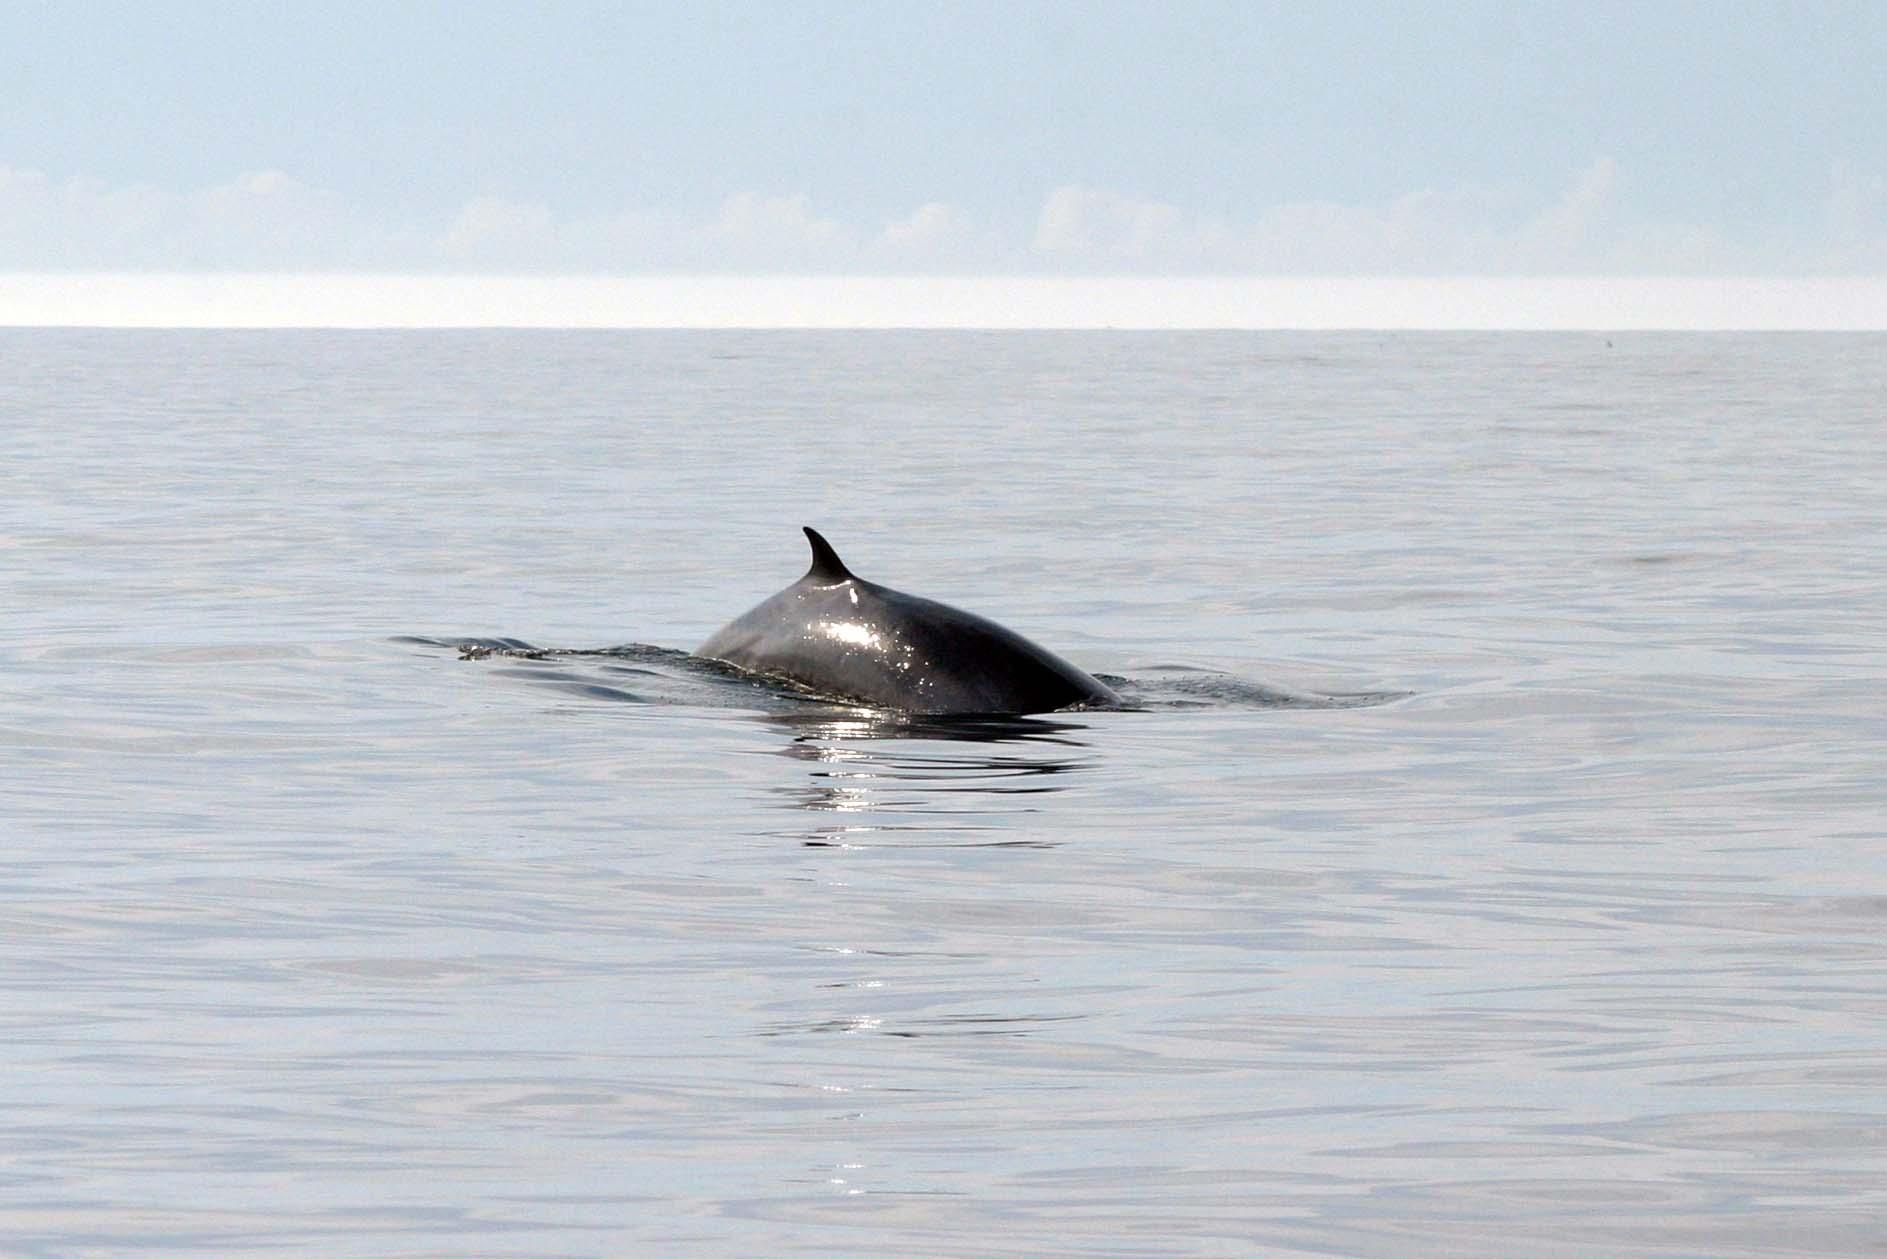 Fin whale off Nova Scotia